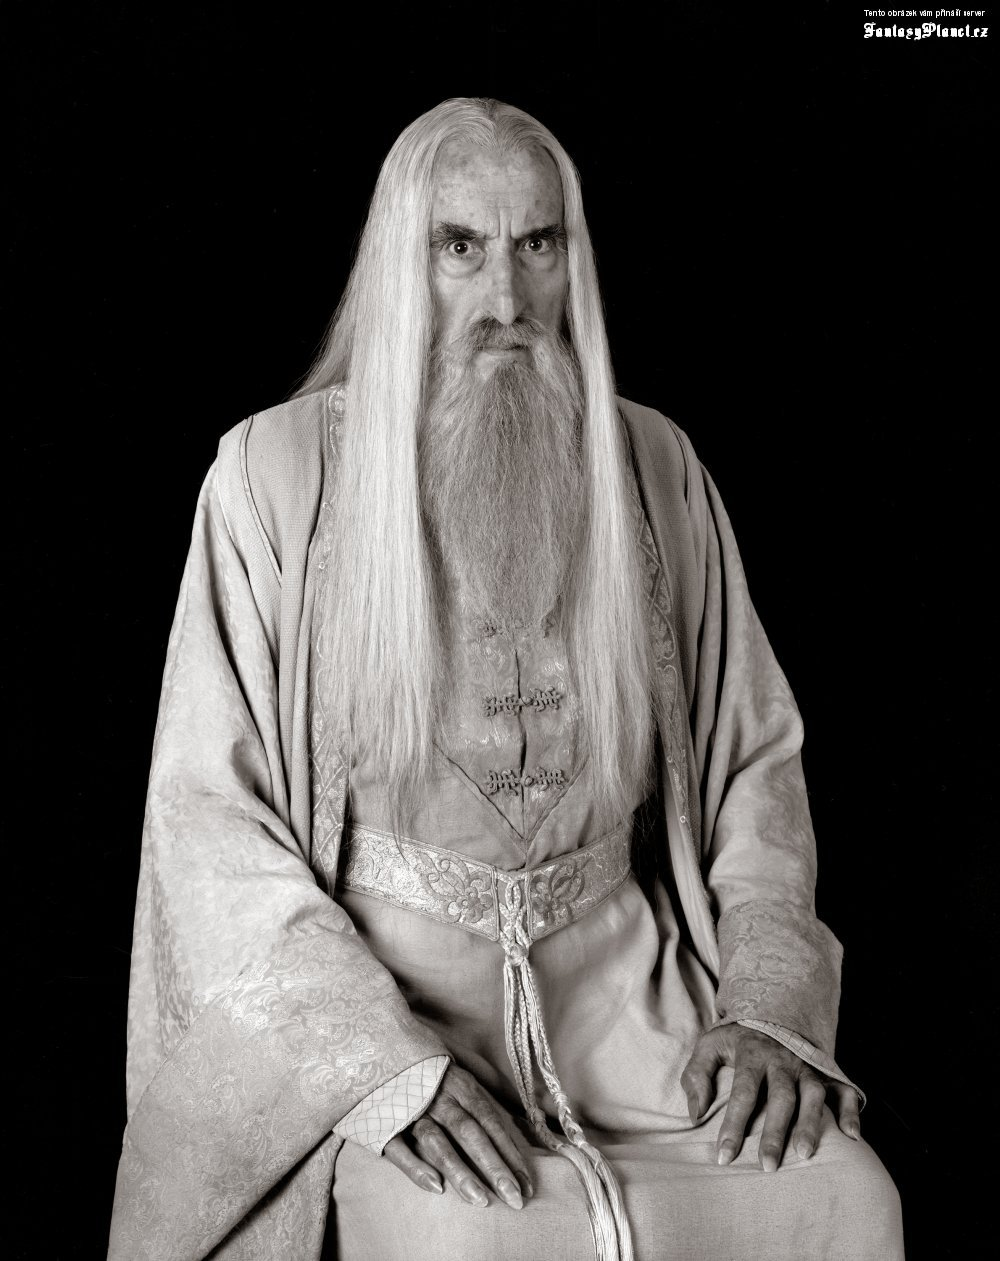 Plik:Saruman2.jpg